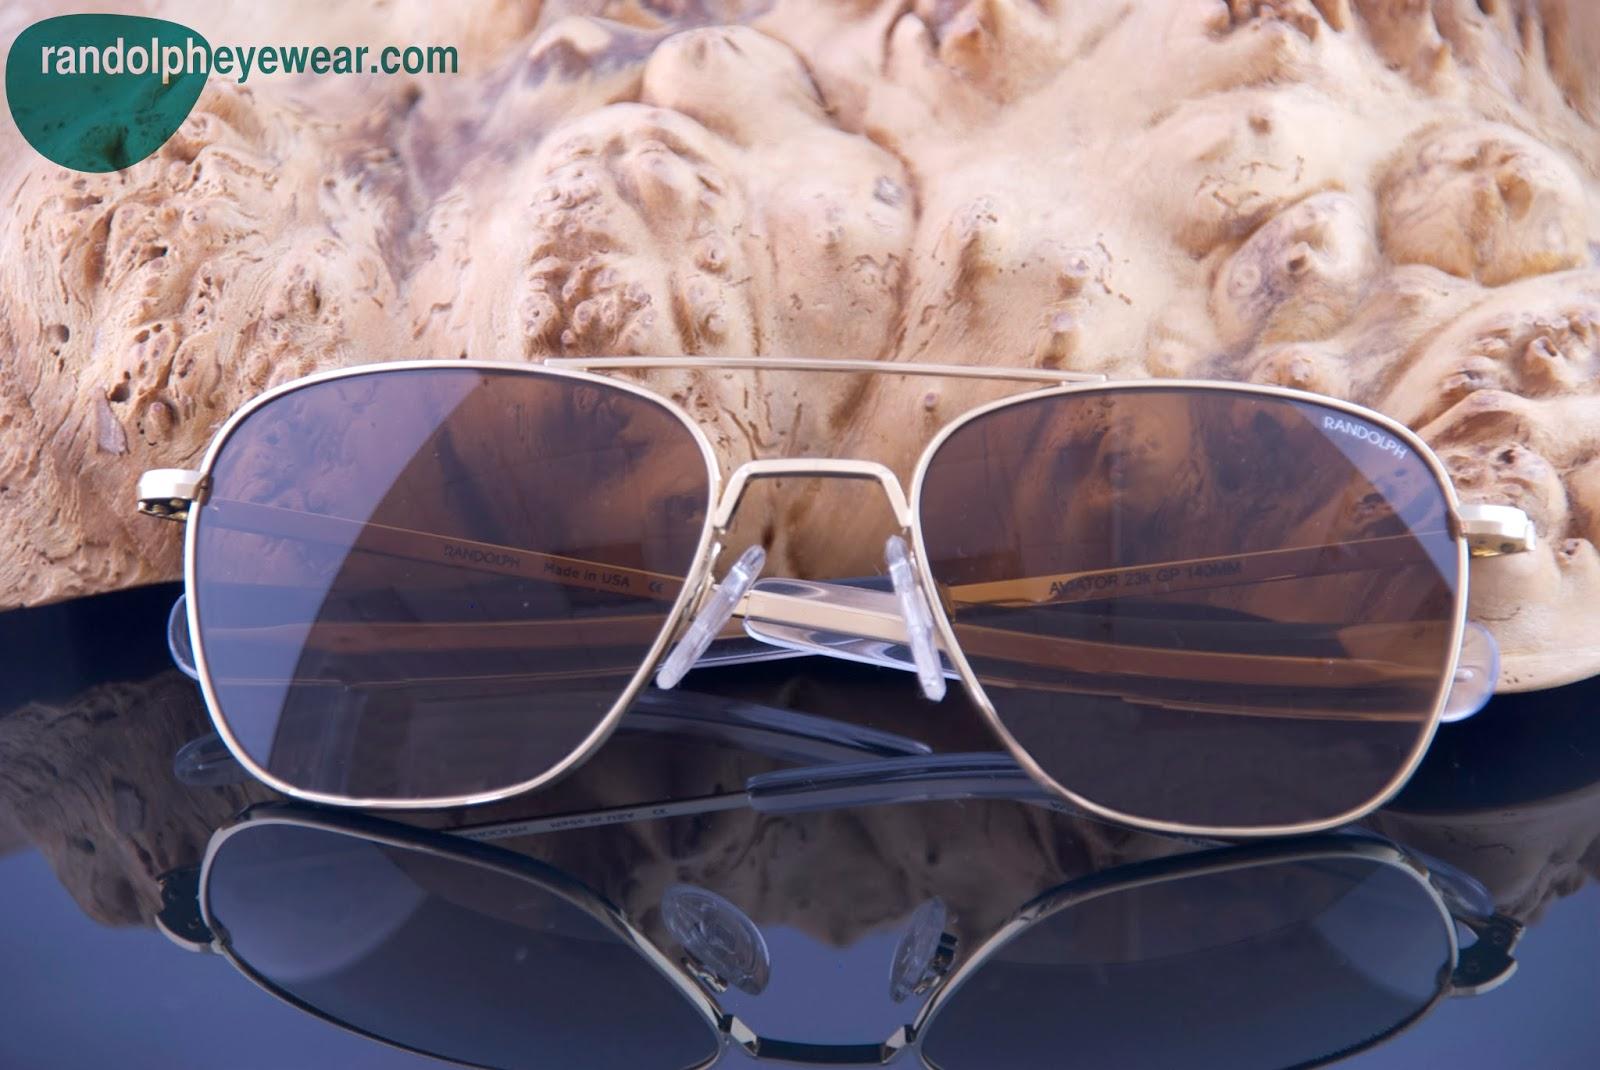 00eb94f3fd Randolph Eyewear  Randolph Aviator Sunglasses - Number One Holiday ...